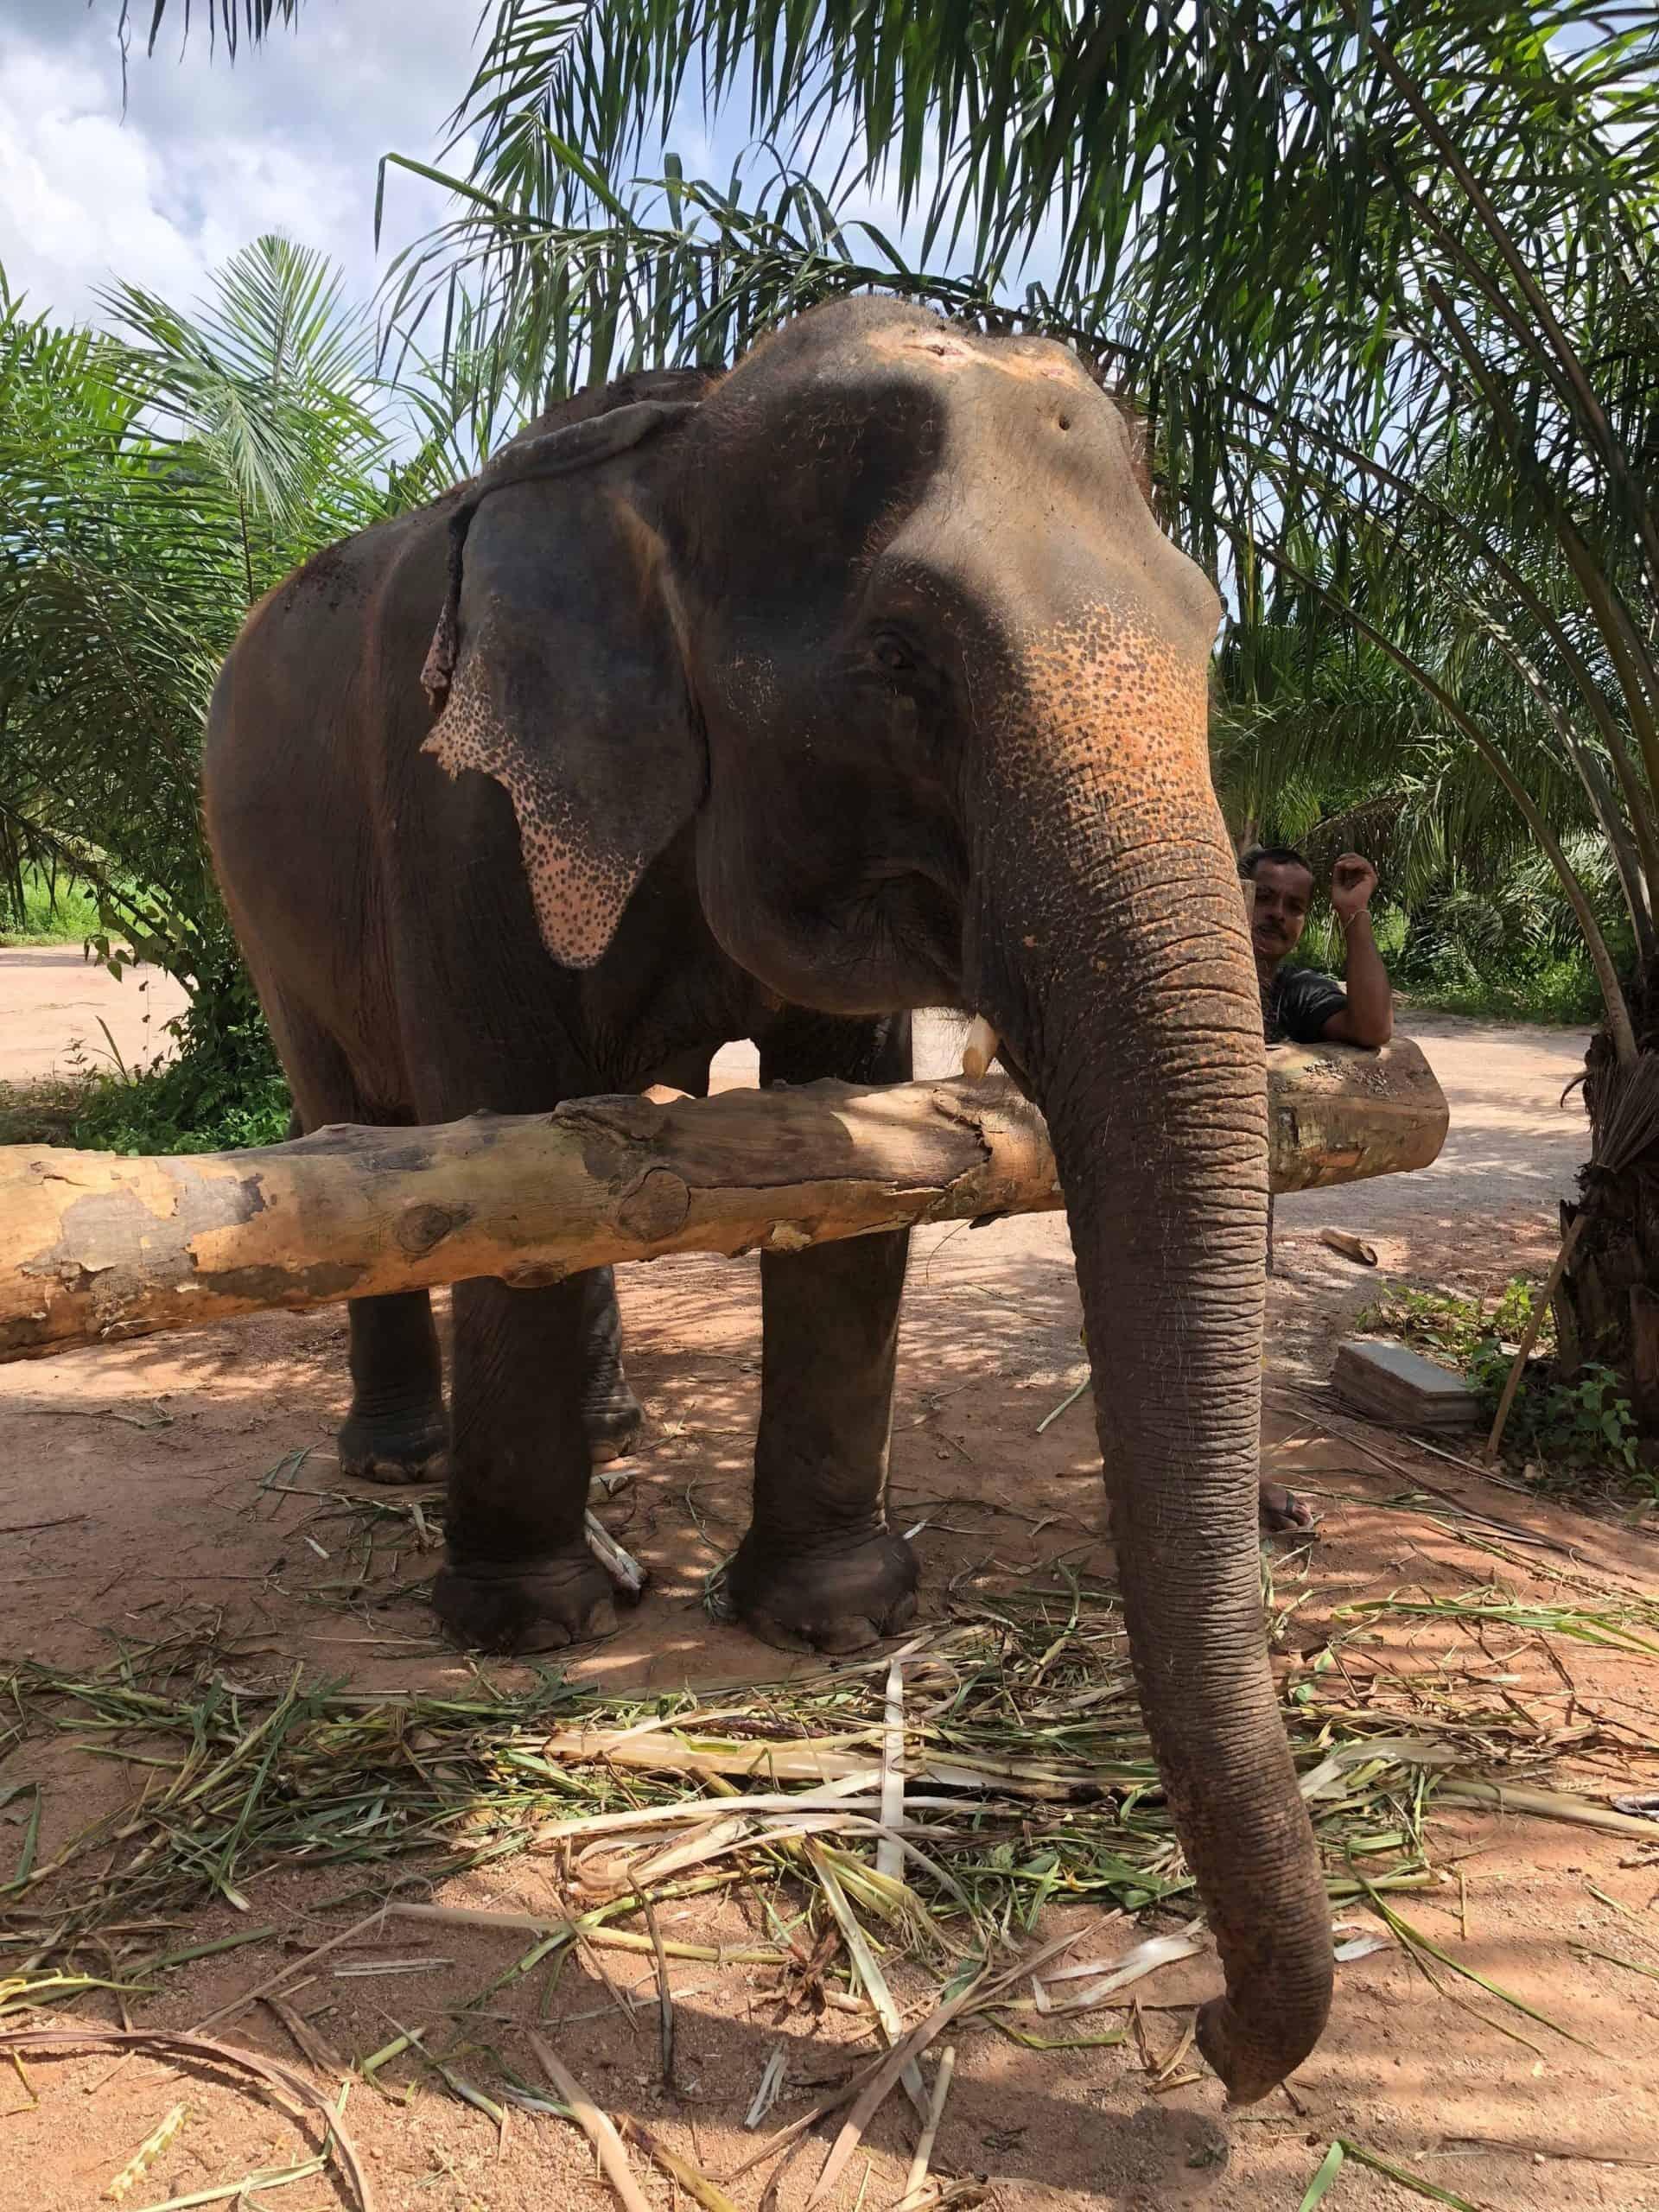 Best Things To Do In Krabi / Krabi Elephant Sanctuary